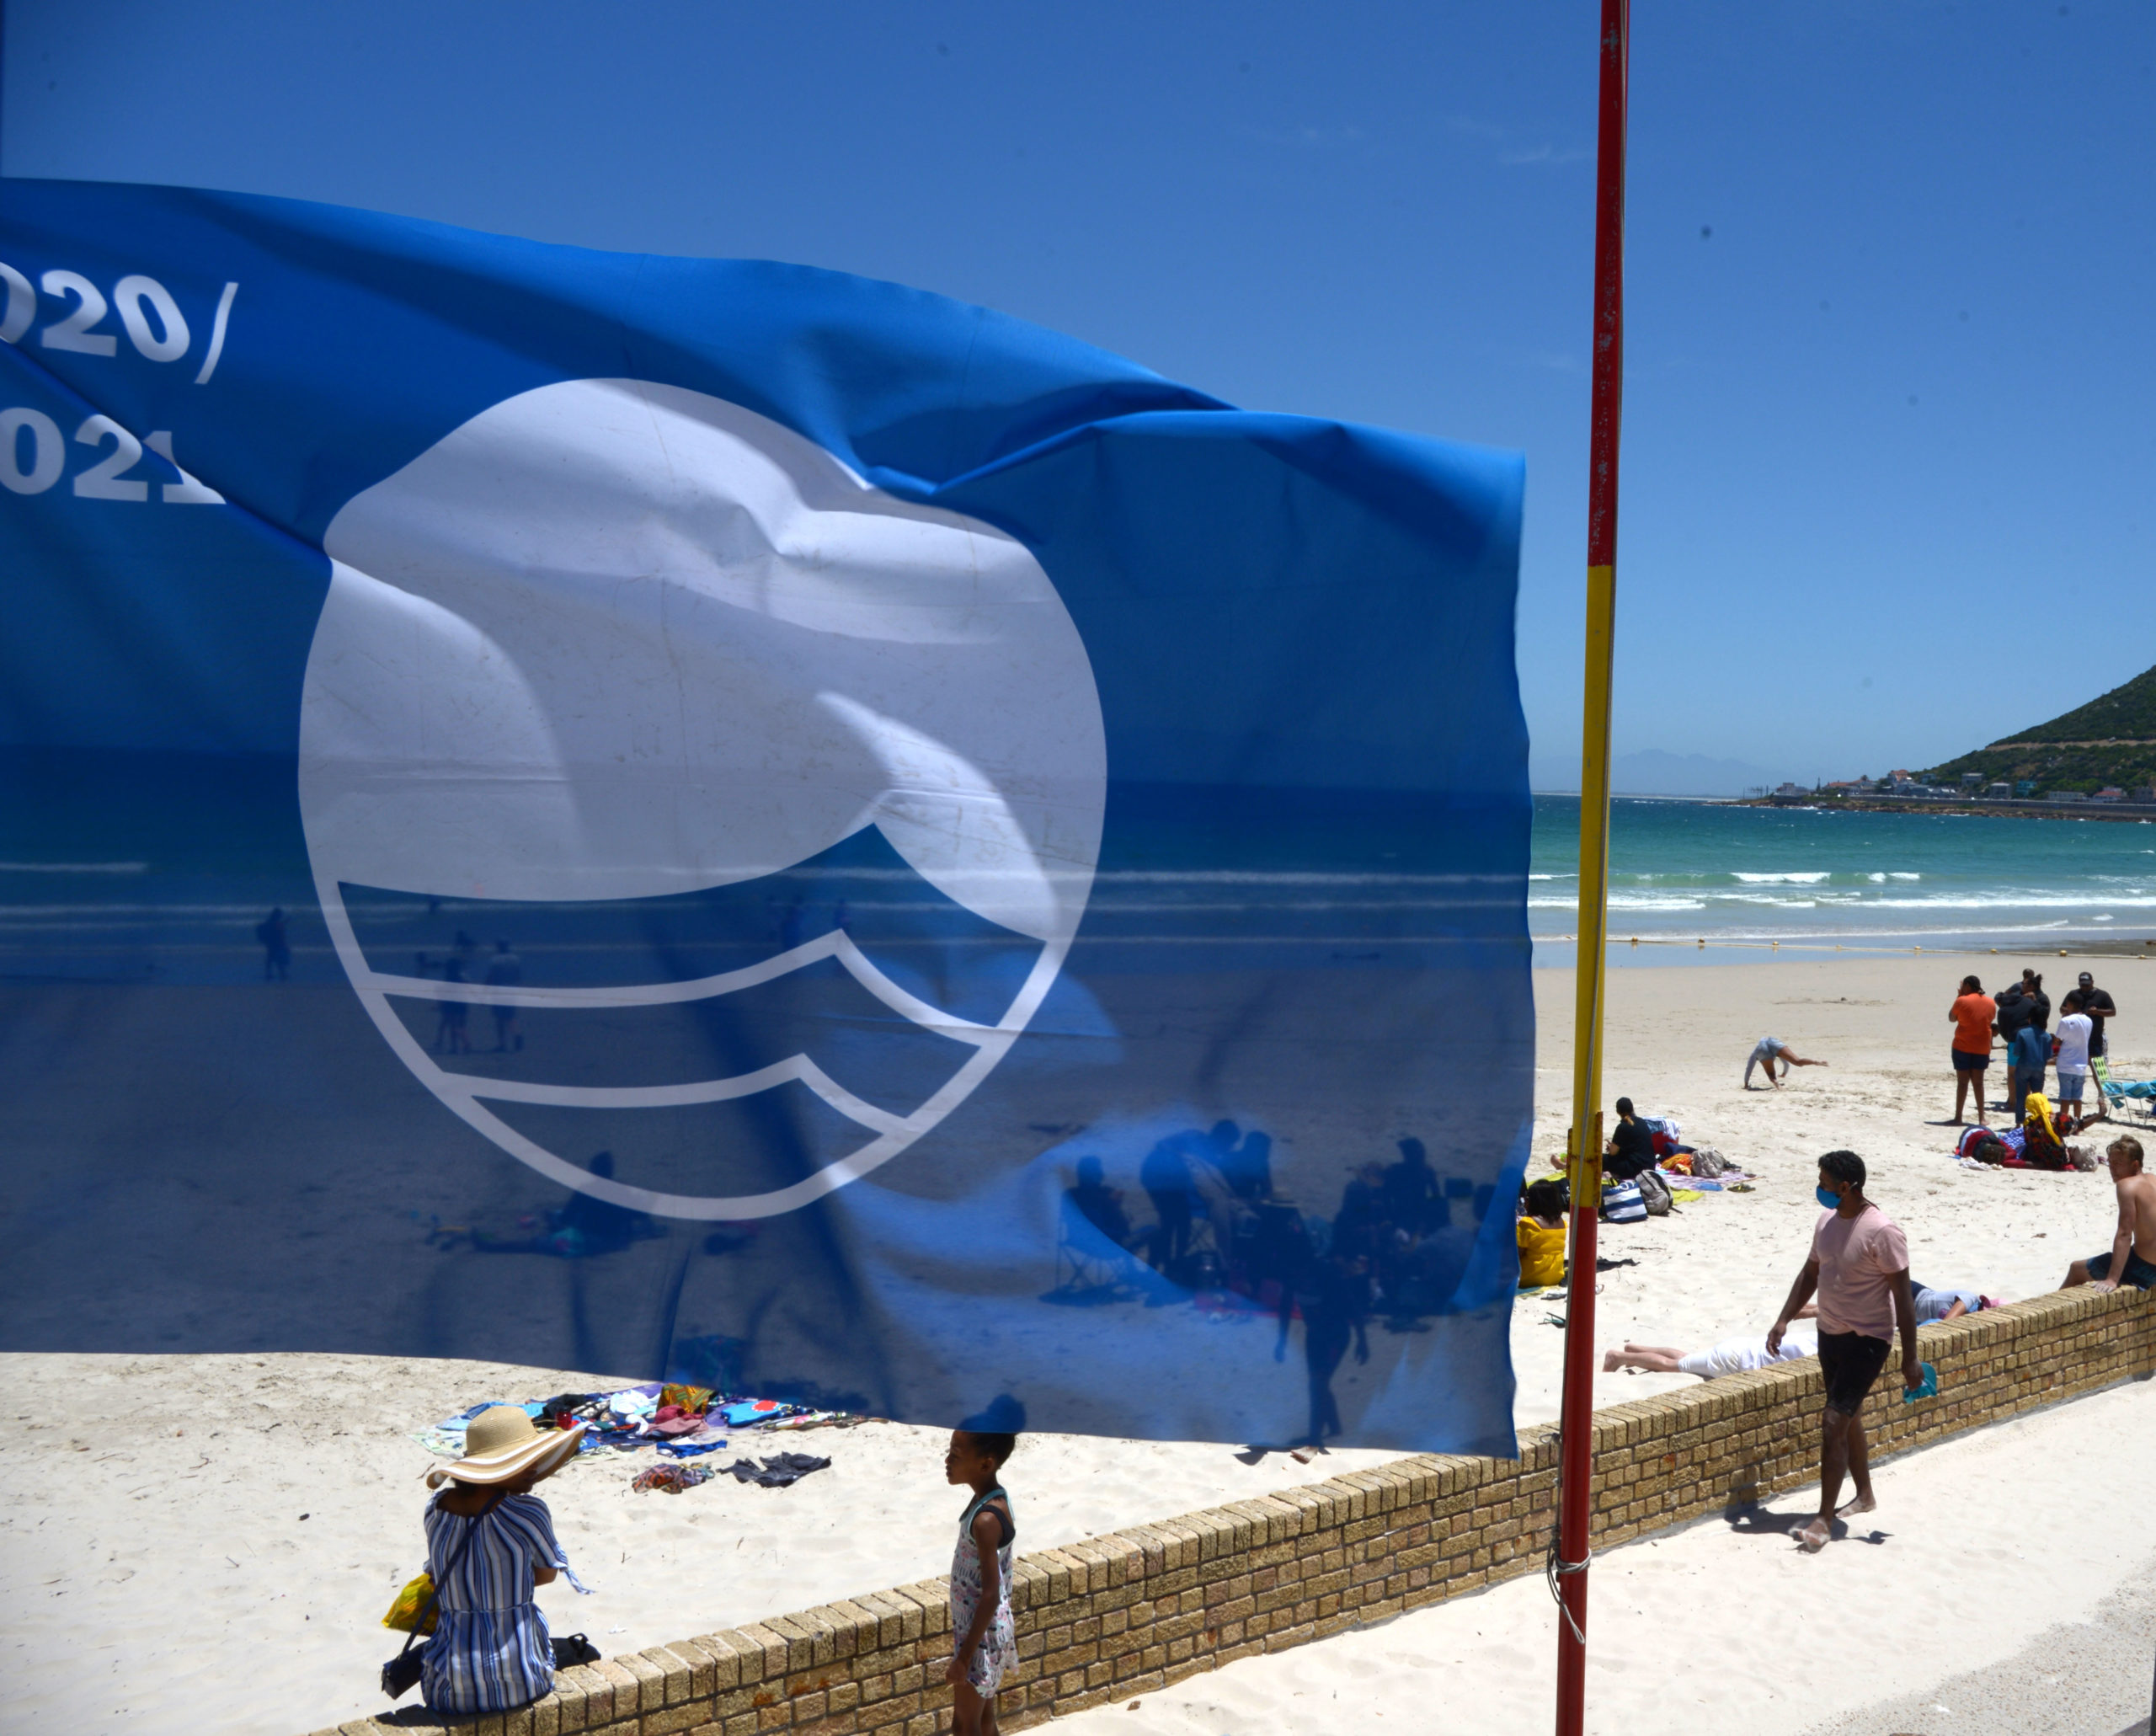 Blue Flag award no guarantee the water is clean - Daily Maverick